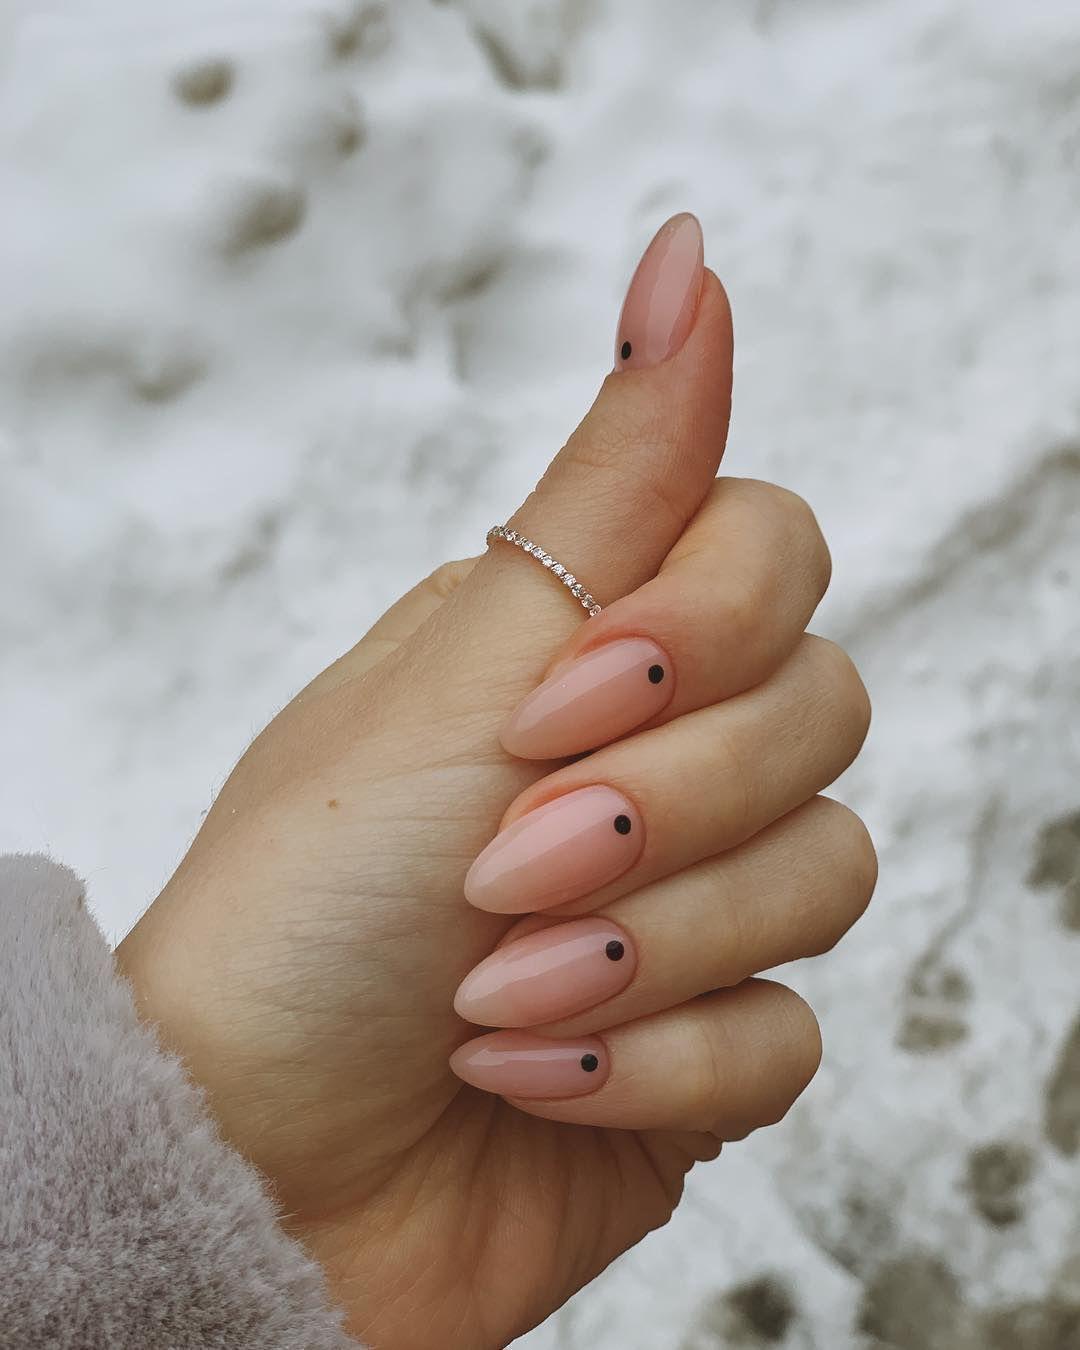 Nails amandel | natural nails short 2020 #almond #nageldesigns #almond #amandel #blacknail #kyliejennernail #nageldesign #Nageldesigns #nagellack #nailwedding #Nails #naturalnail #pinknail #shortnail #summernail